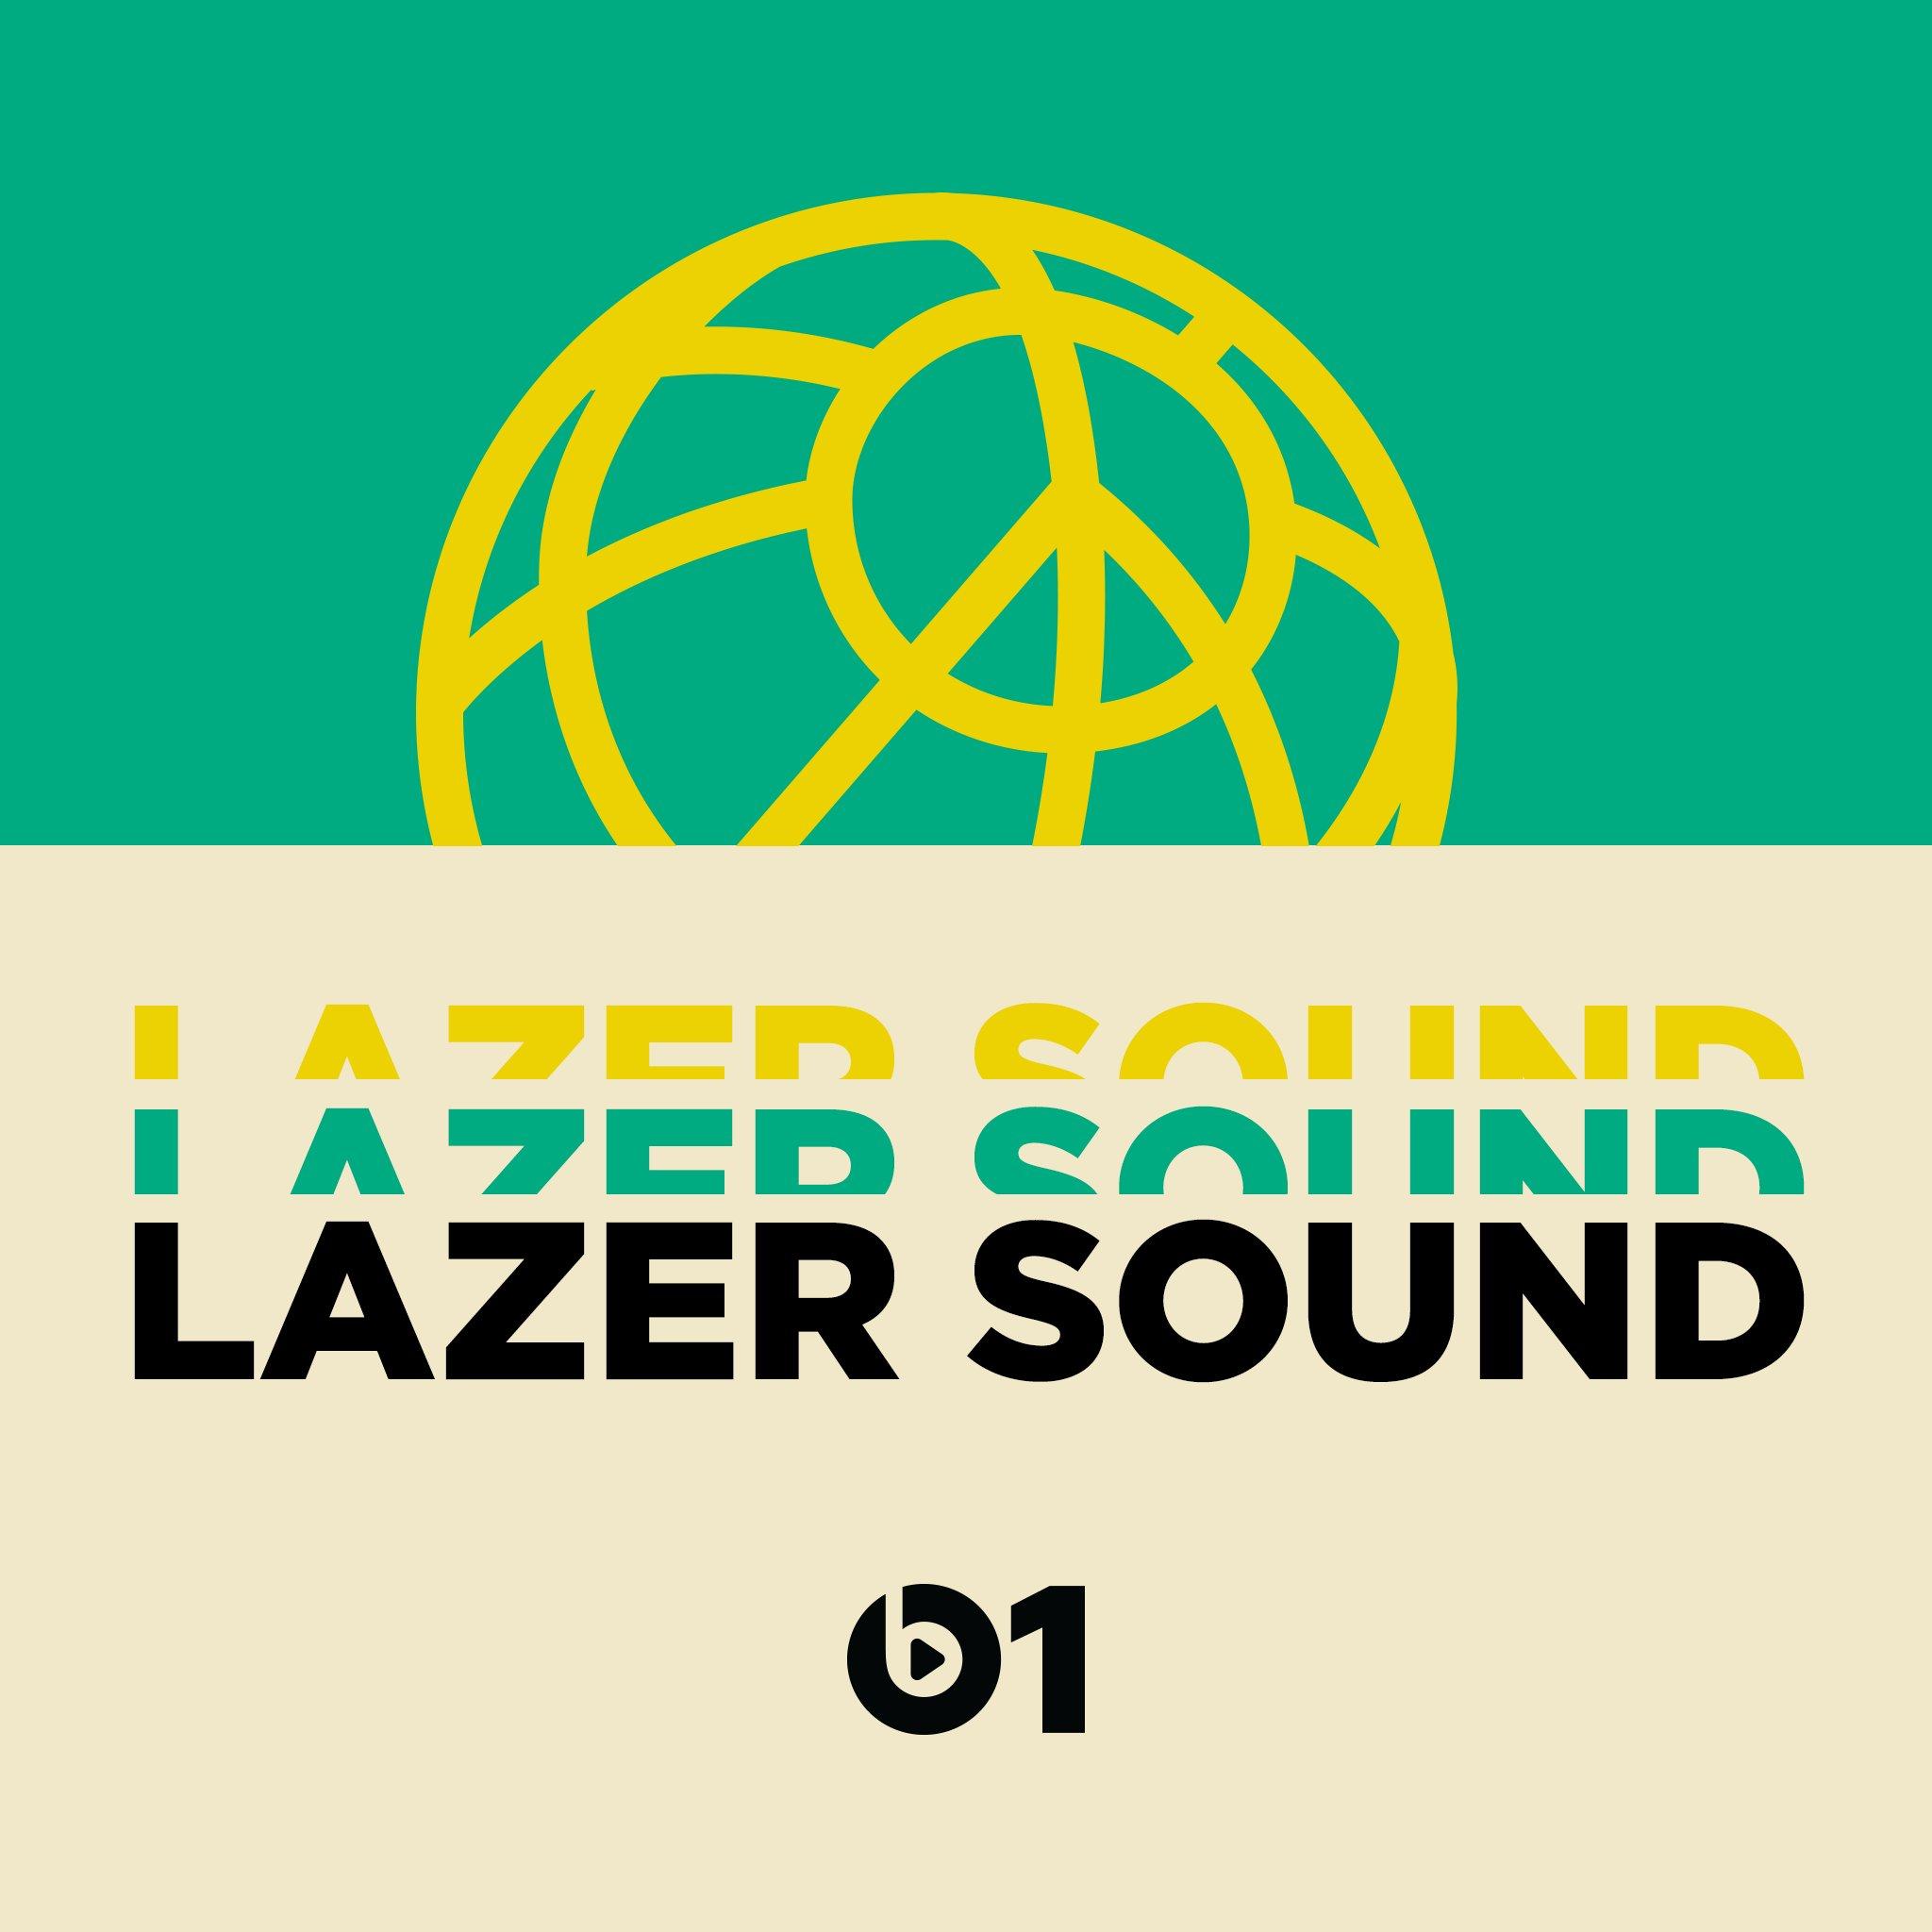 LAZER SOUND ESSENTIAL MIX  W/ GUEST MIX BY @FULLYFOCUS LISTEN NOW https://t.co/zQM3poyeIg @BEATS1 @APPLEMUSIC https://t.co/cENCXjKD1J